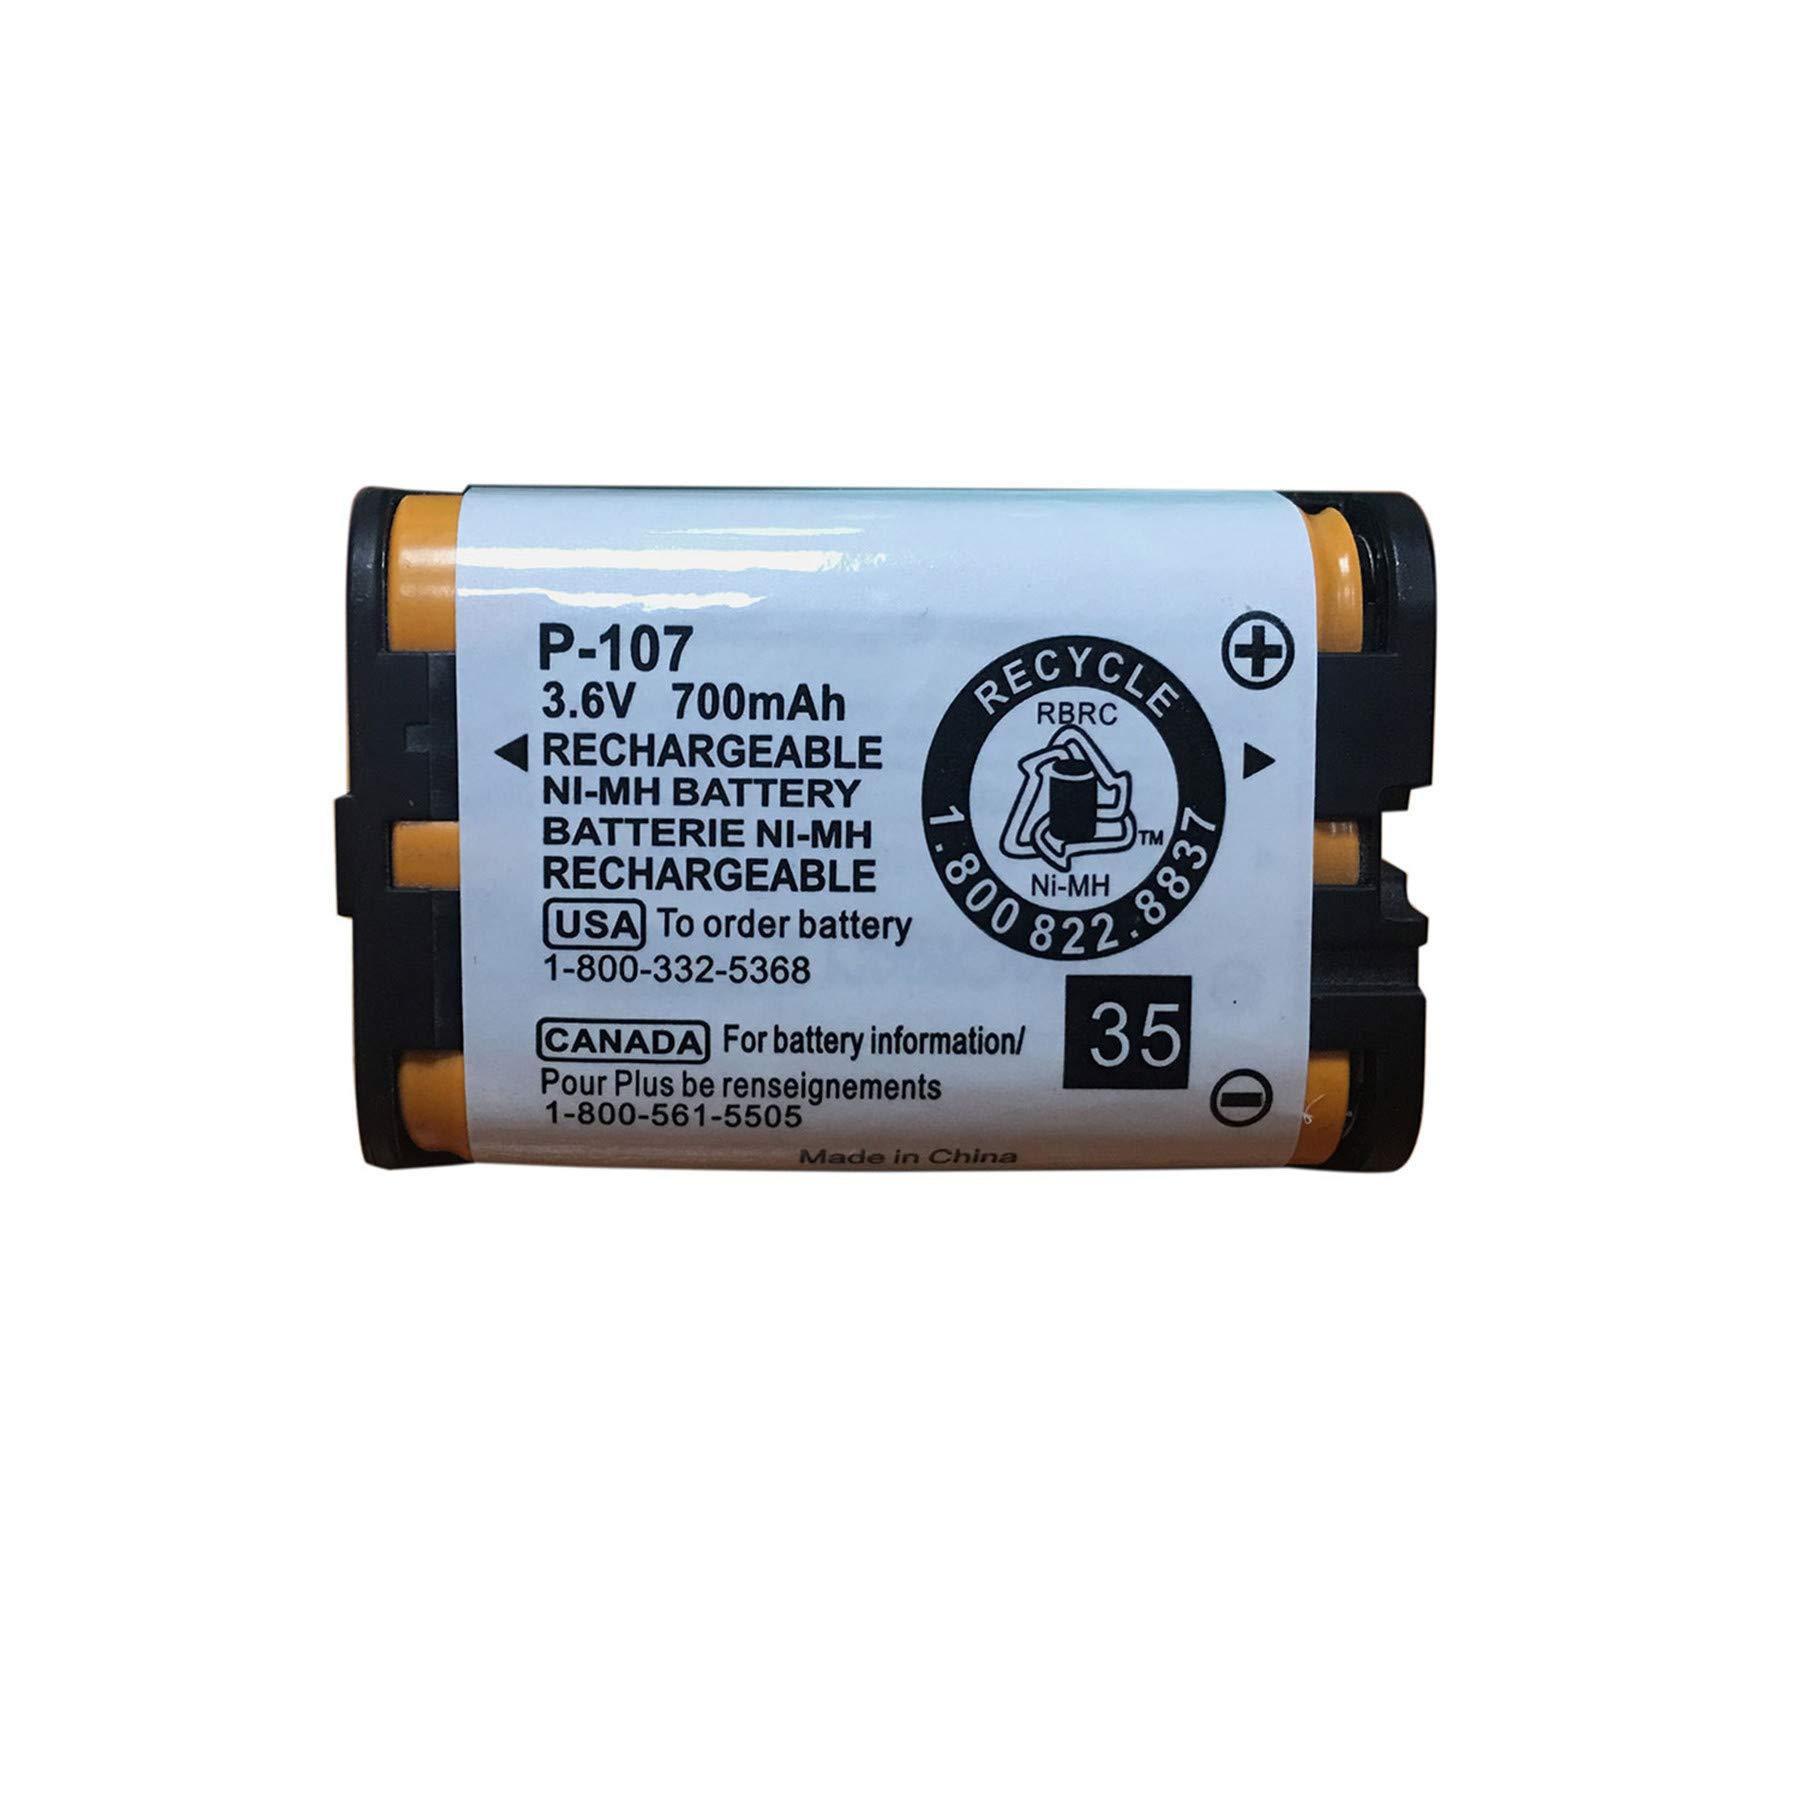 GEILIENERGY 3HHRP107 Rechargeable Batteries Compatible with for Panasonic HHR-P107 HHR-P107A HHRP107A Cordless Phone 3.6v 700mAh Ni-MH(1 Pack)